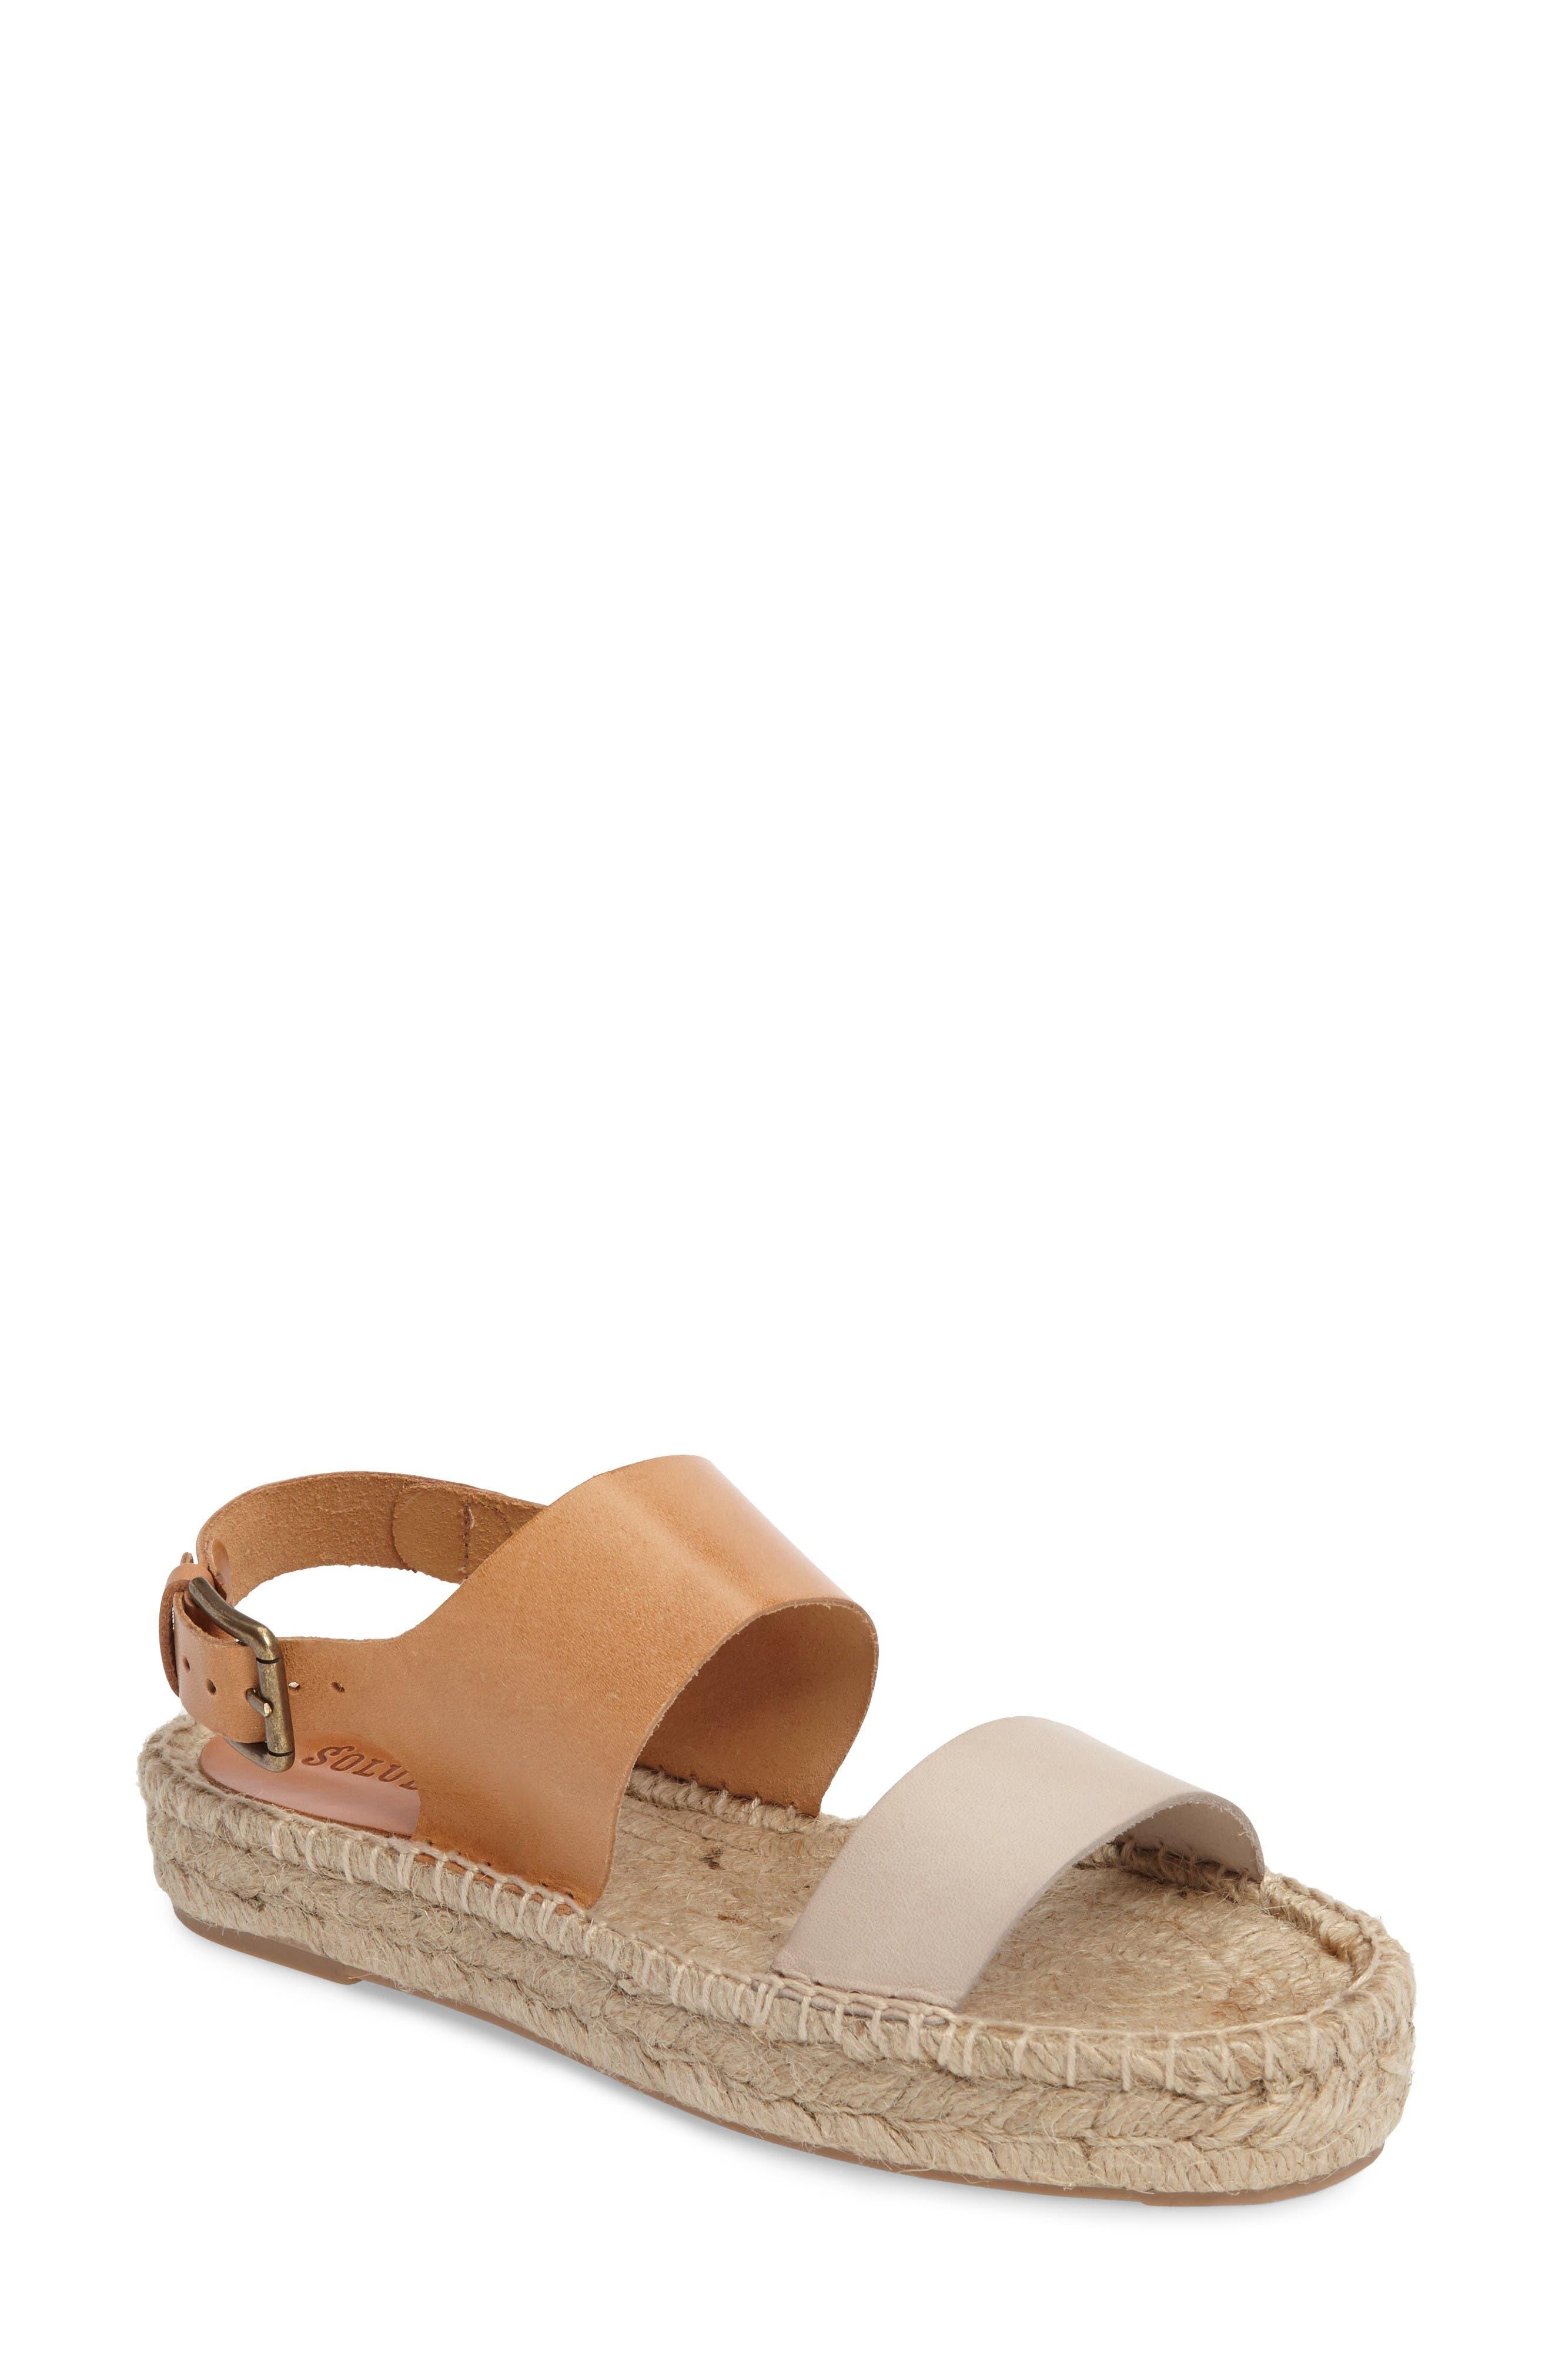 Alternate Image 1 Selected - Soludos Platform Espadrille Sandal (Women)